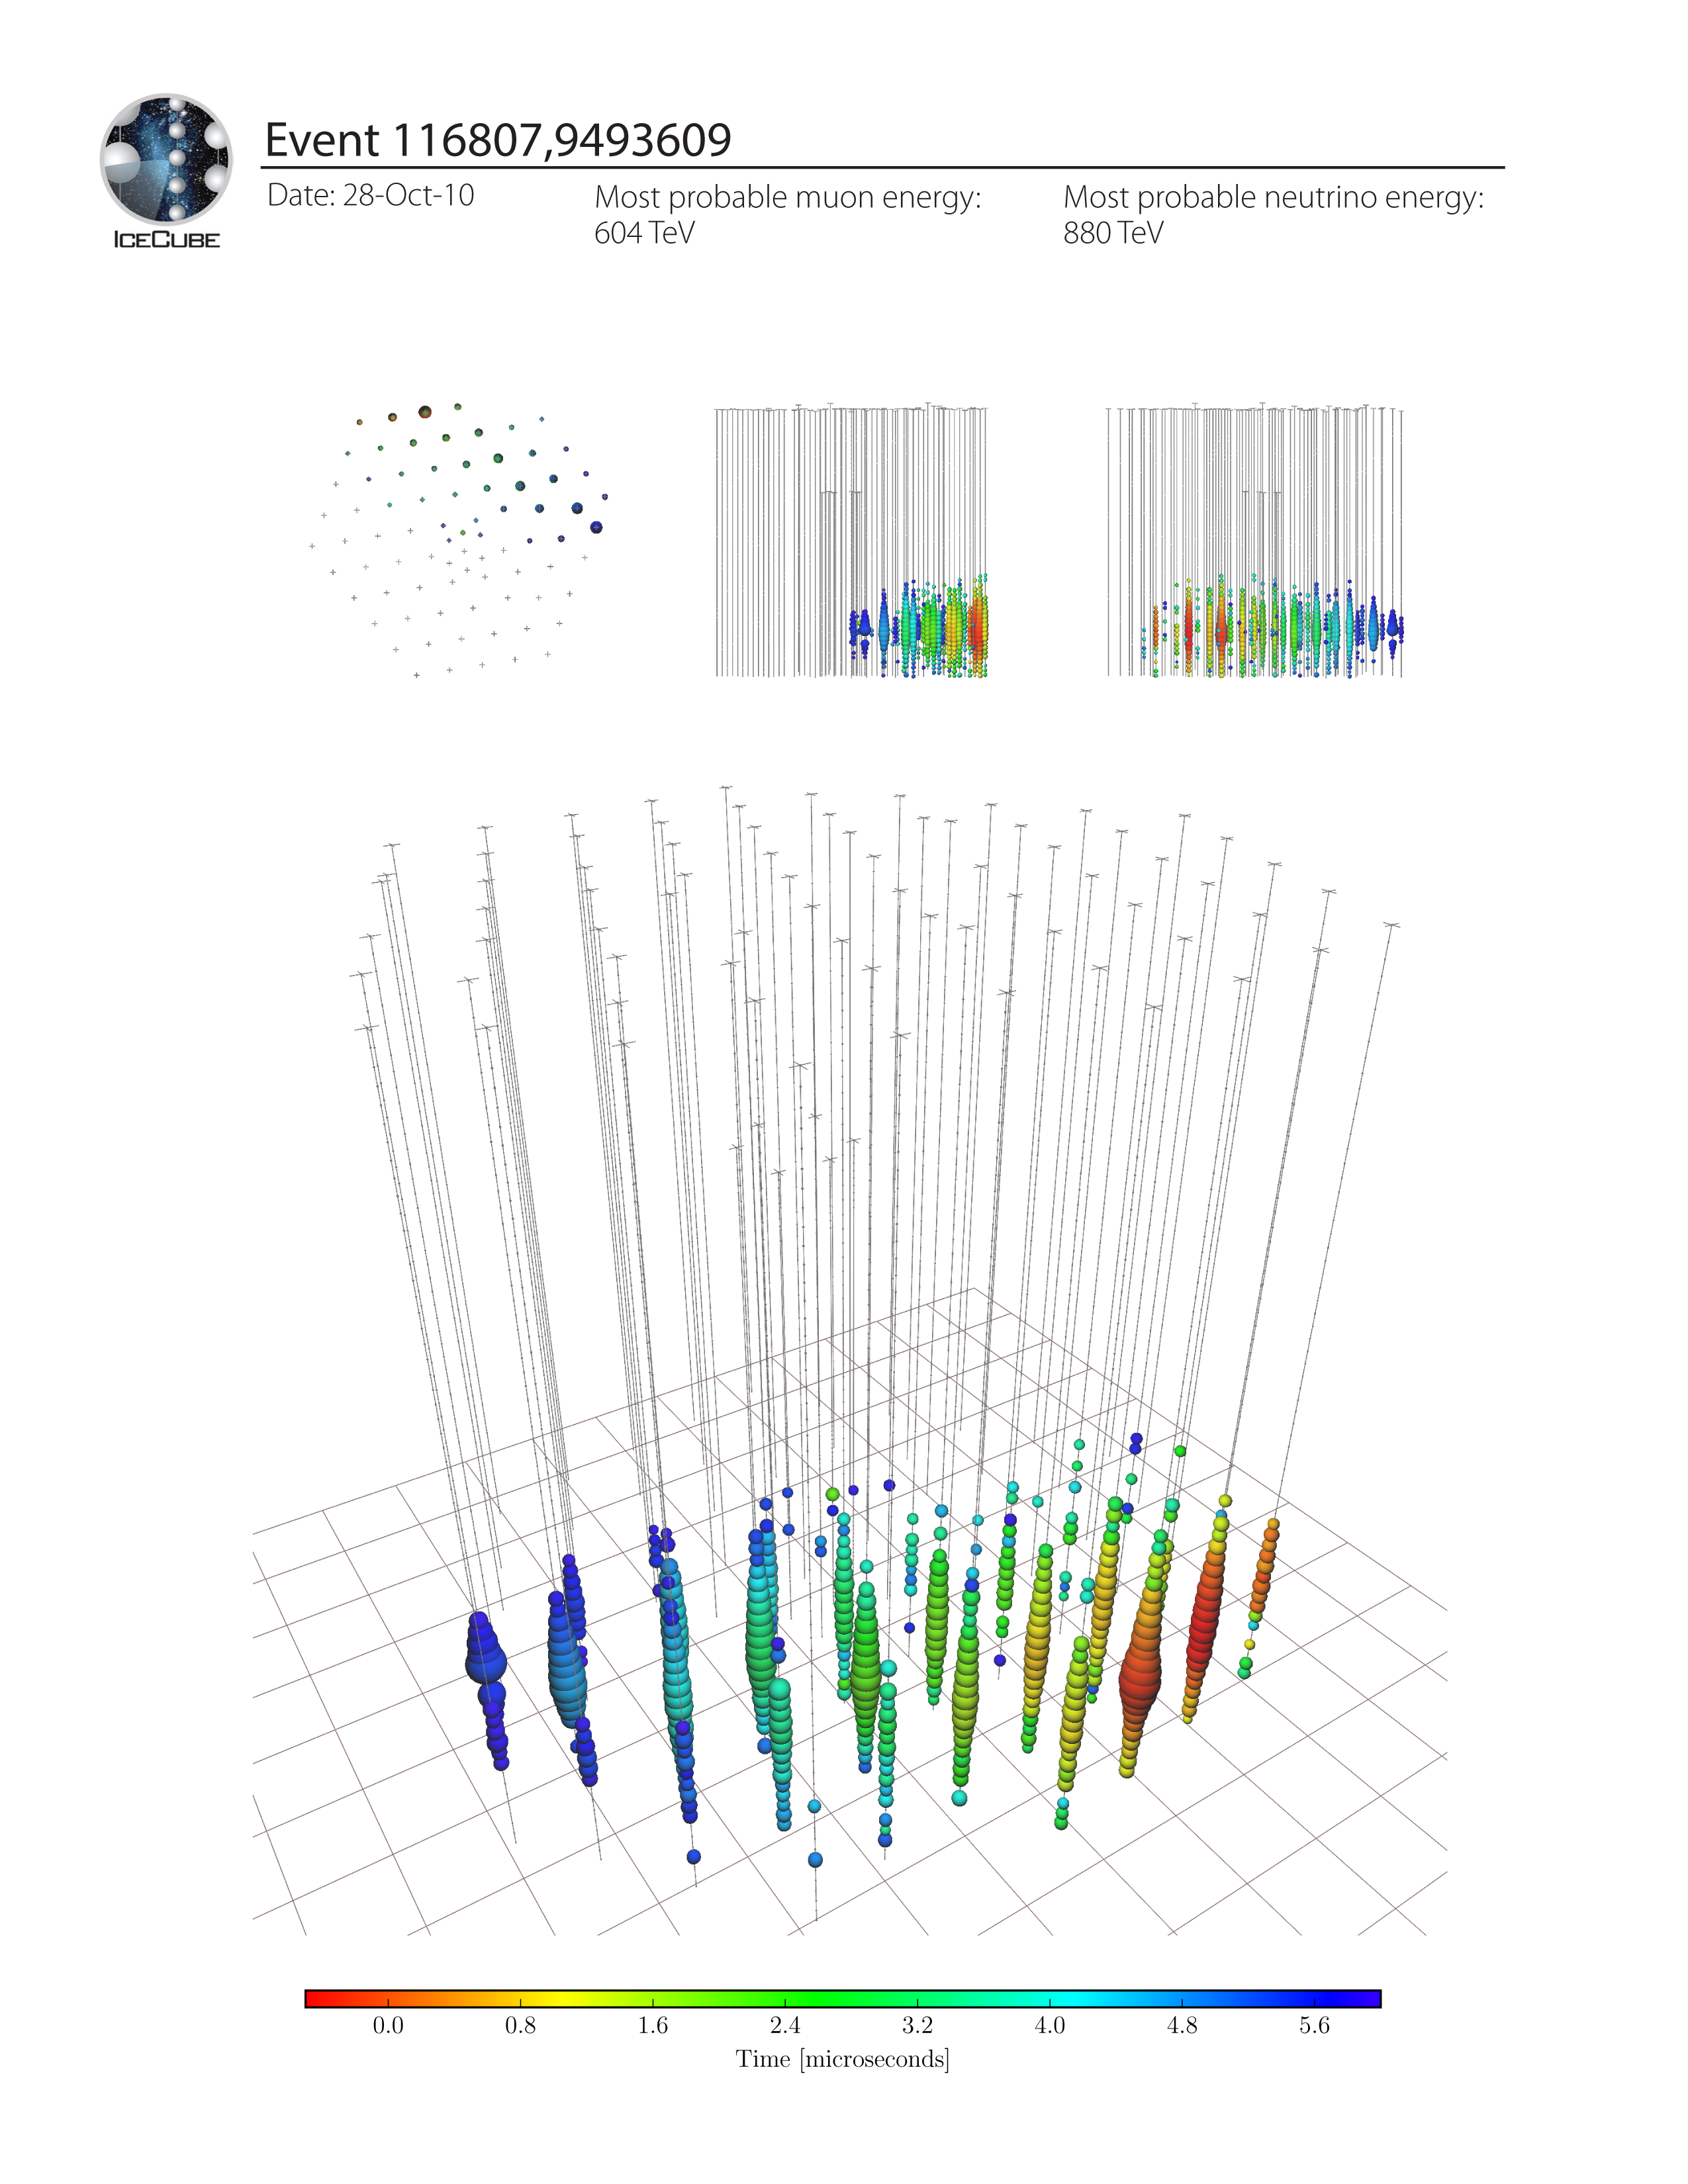 IceCube Event ID 116807,9493609. Most probable neutrino energy: 880 TeV, October 28, 2010